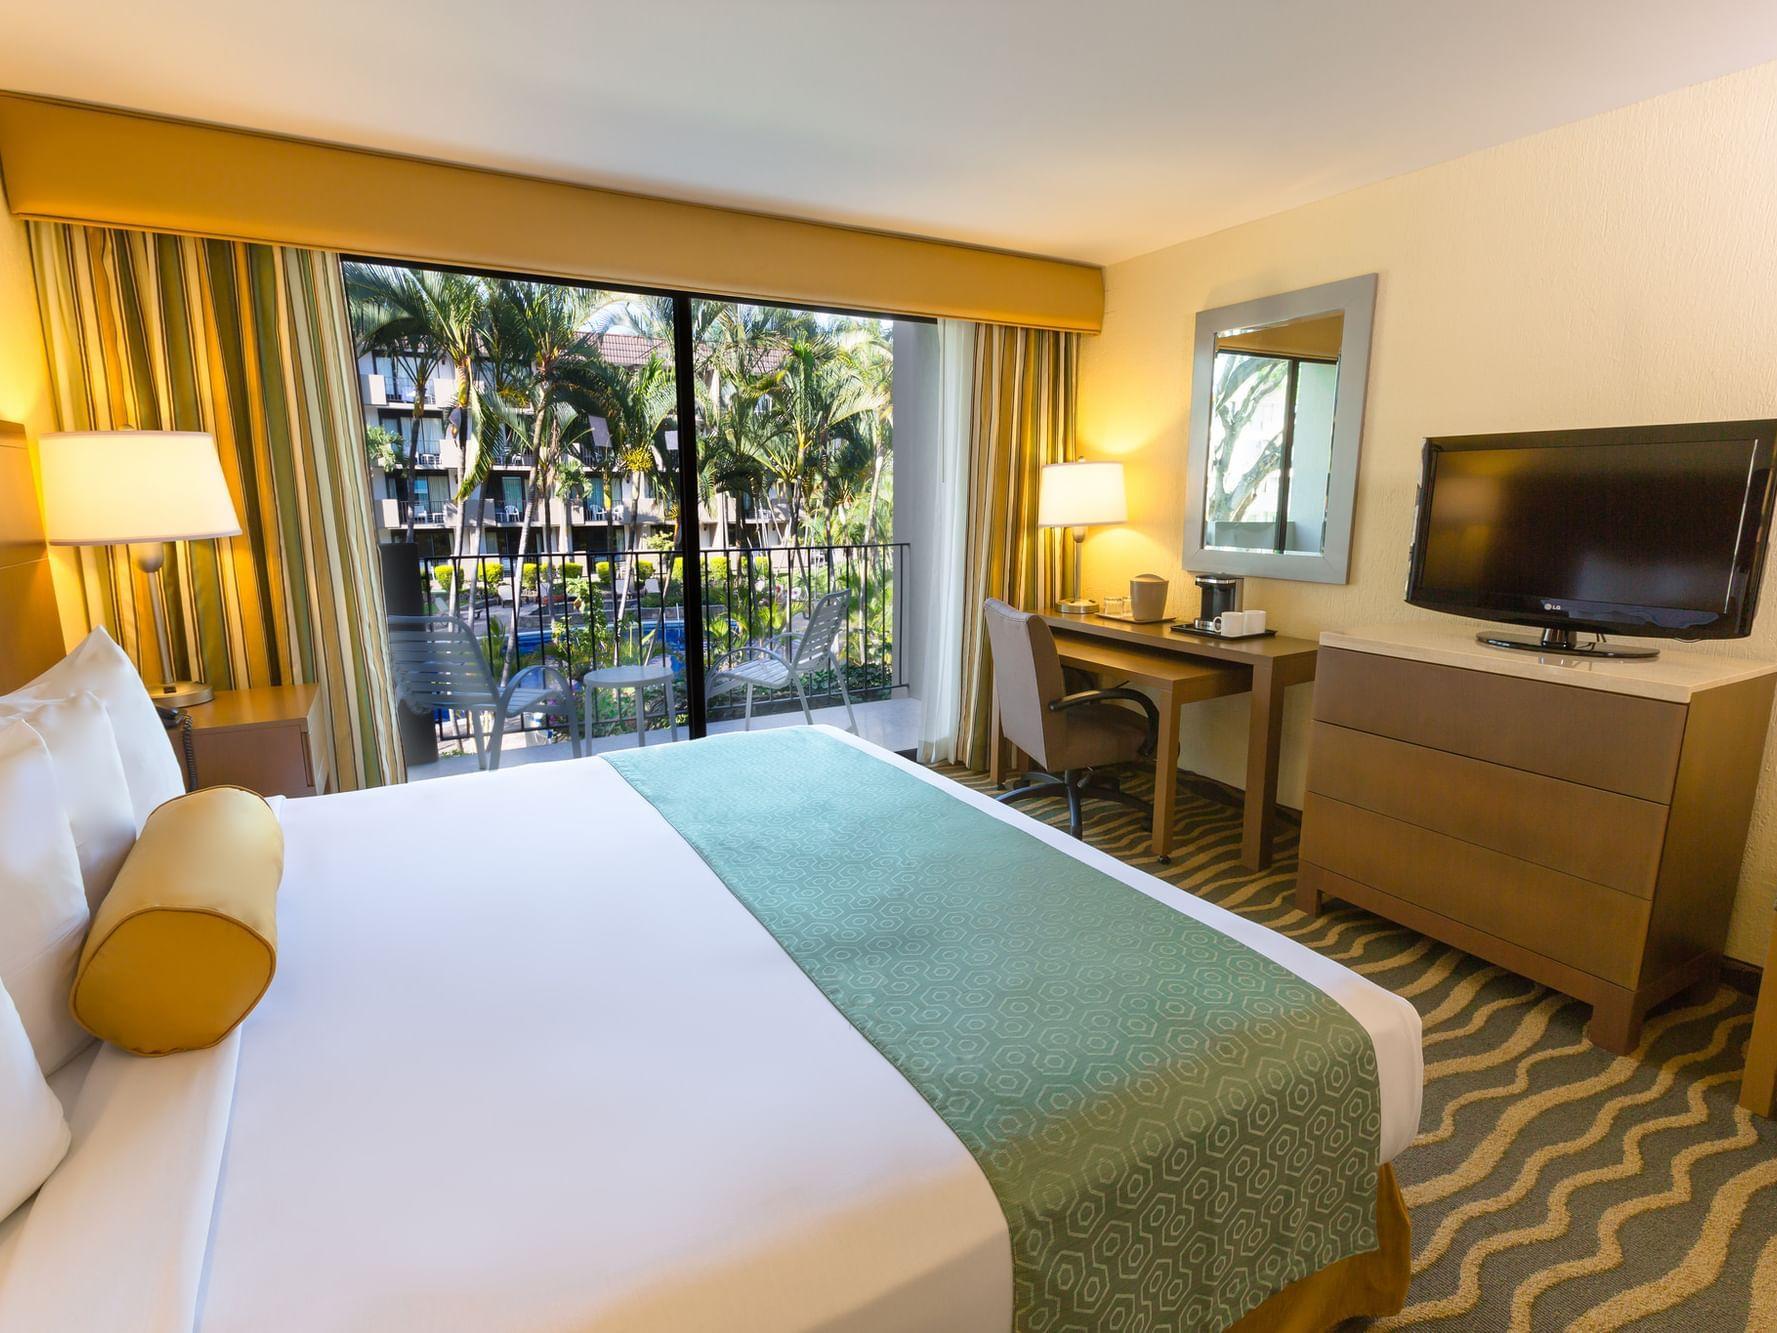 King size bed in Premier Room at Best Western Plus San Jose